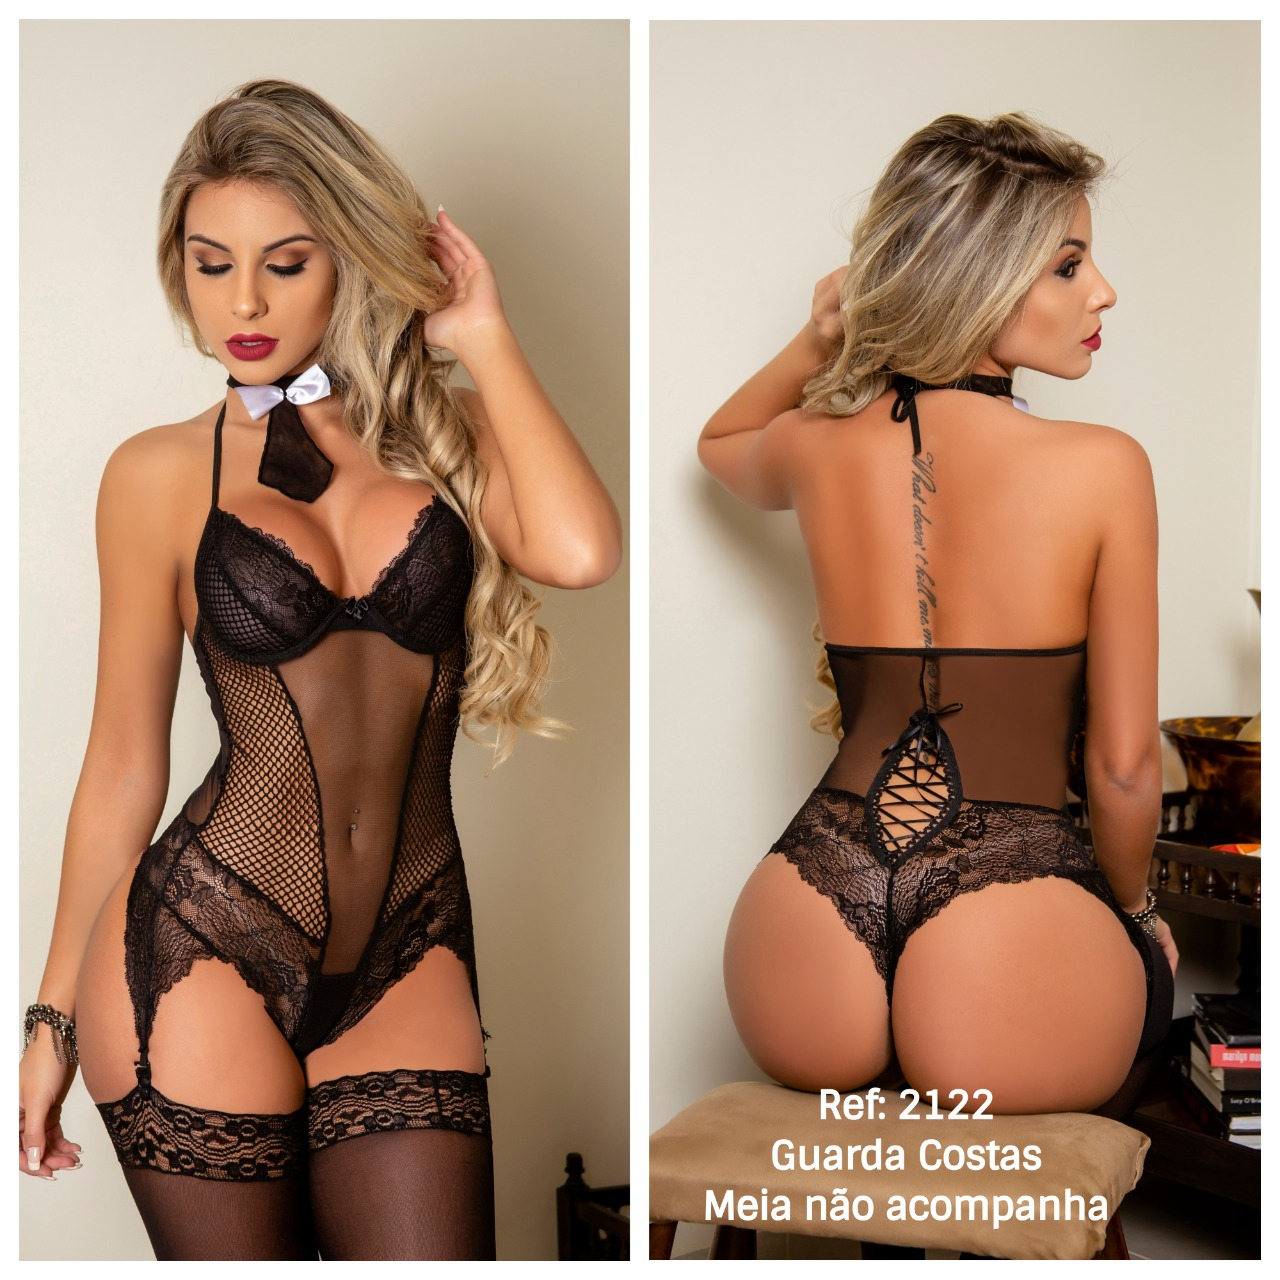 Guarda Costas - Body C/ Gravata